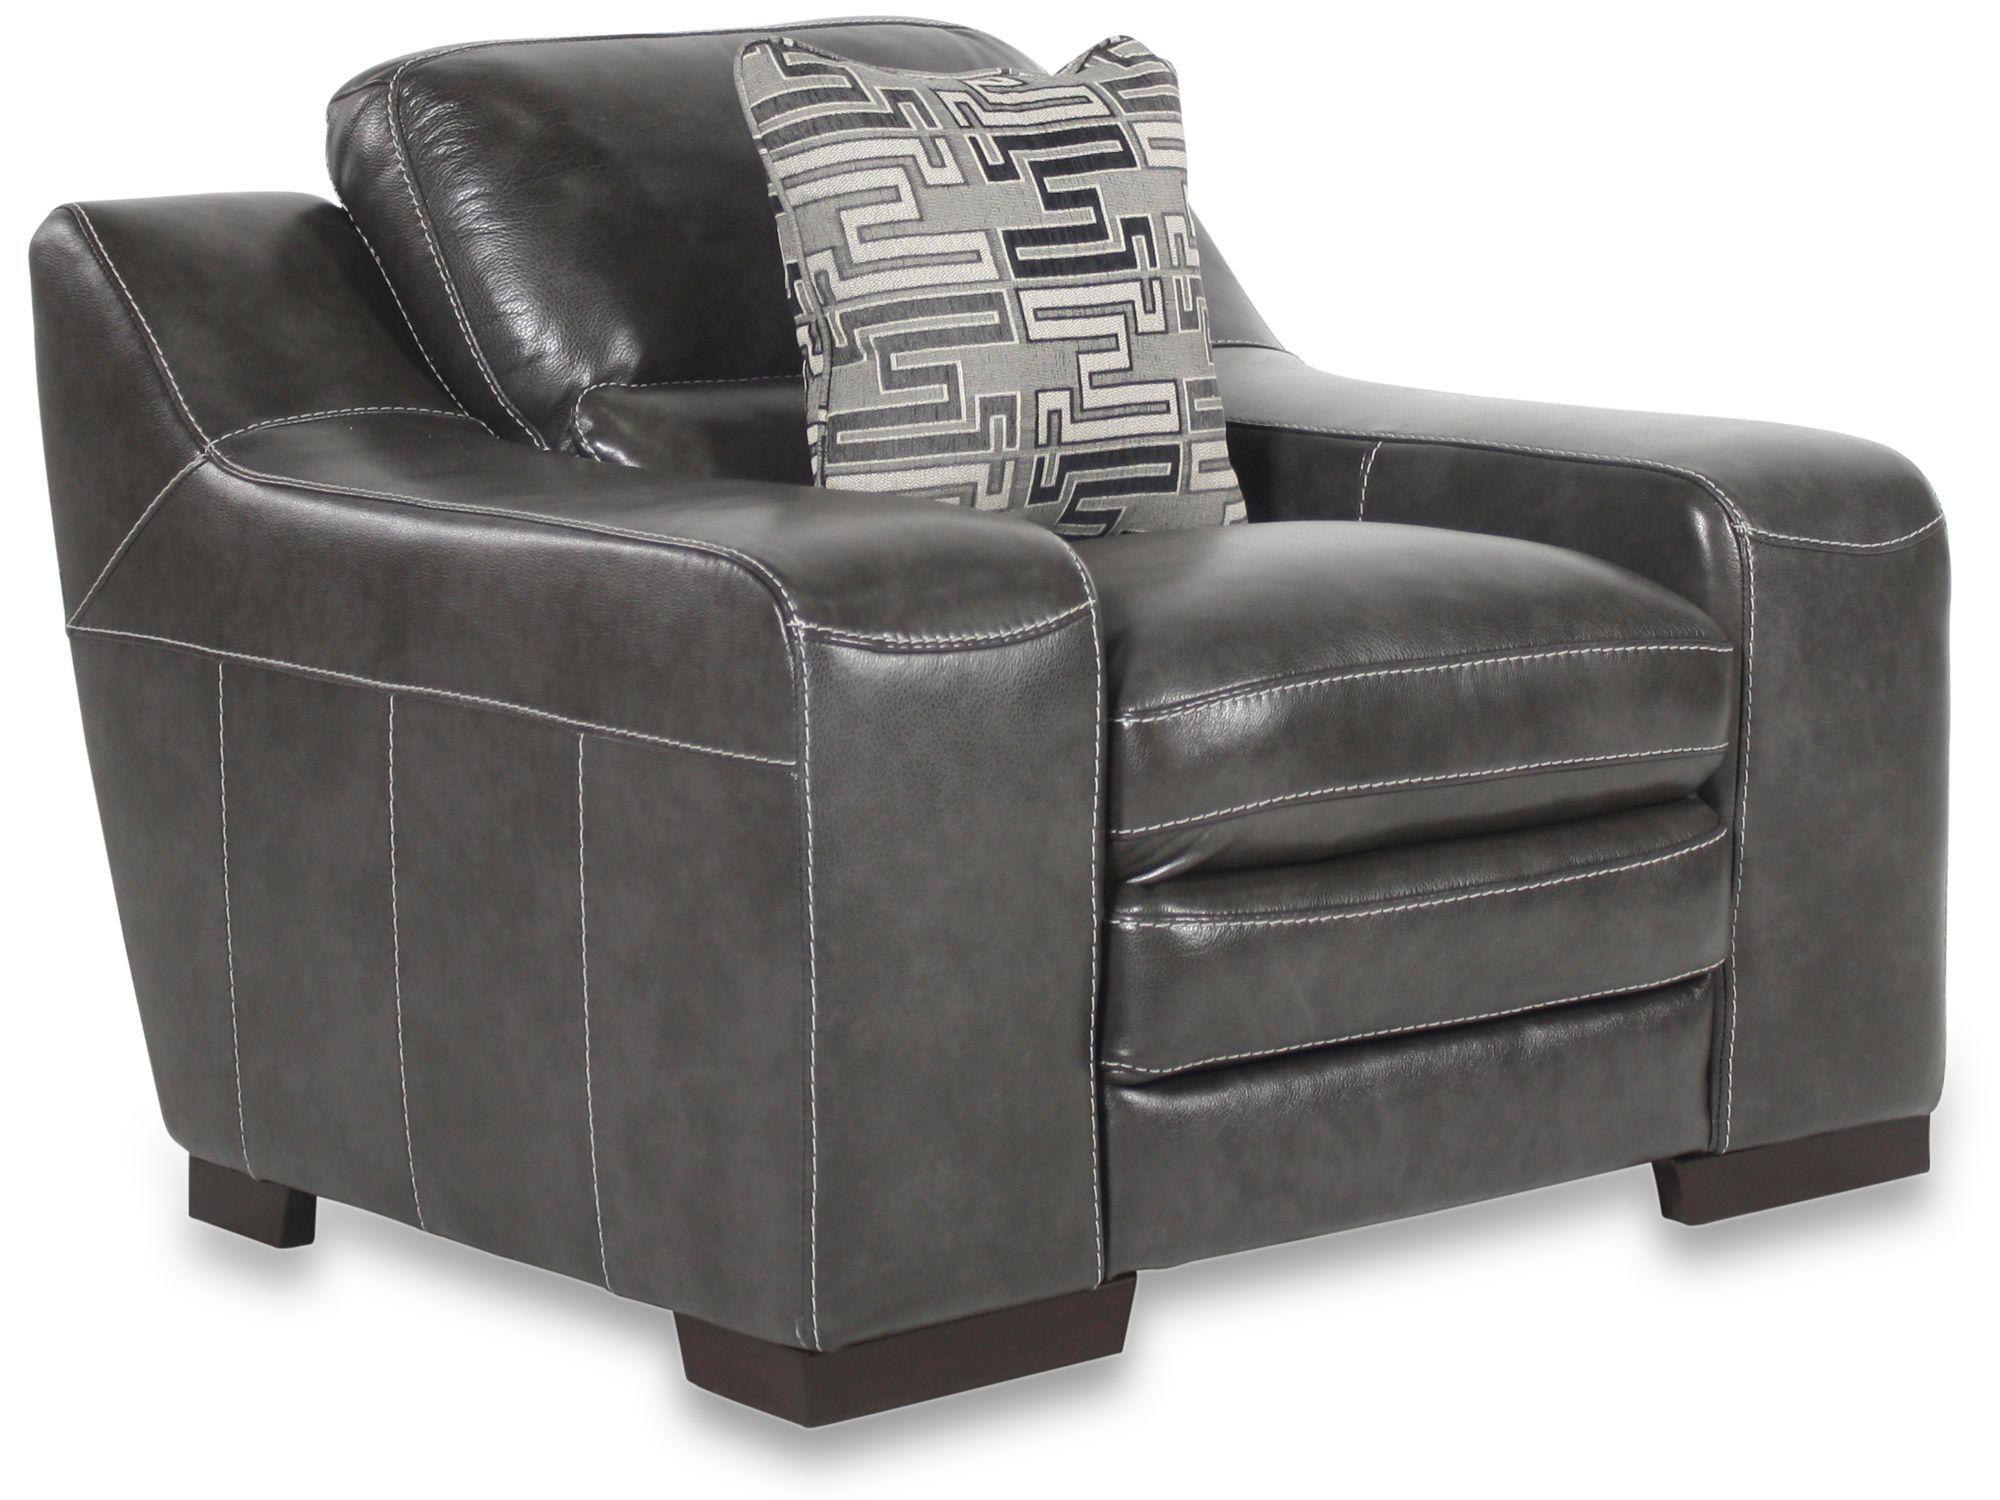 leather sofas in tulsa ok next sofia sofa reviews simon li stampede charcoal chair | mathis brothers ...